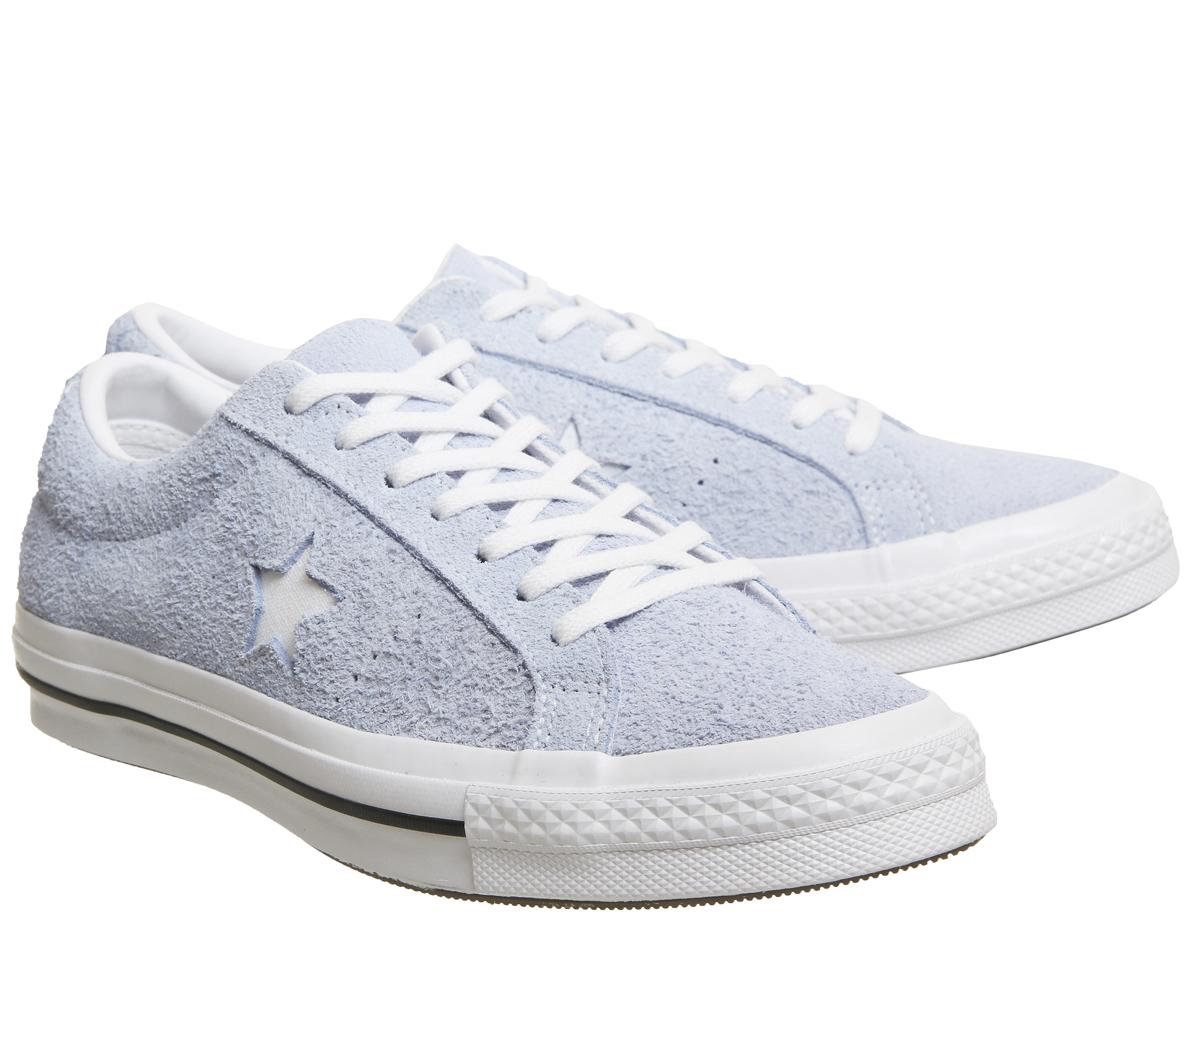 Womens Converse One Star Trainers BLUE CHILL WHITE Trainers Shoes  047e7e9e6